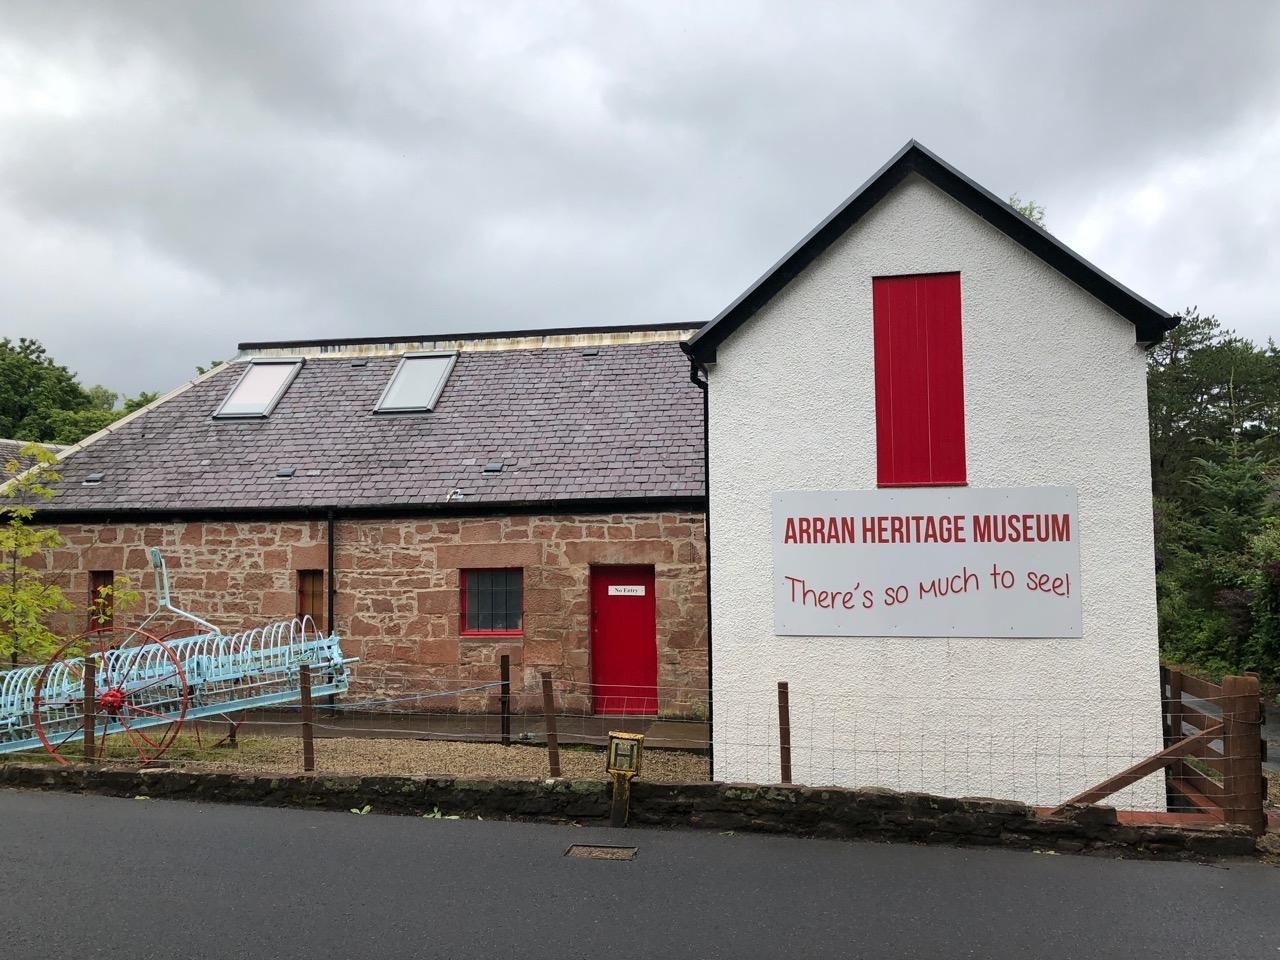 Arran Heritage Museum